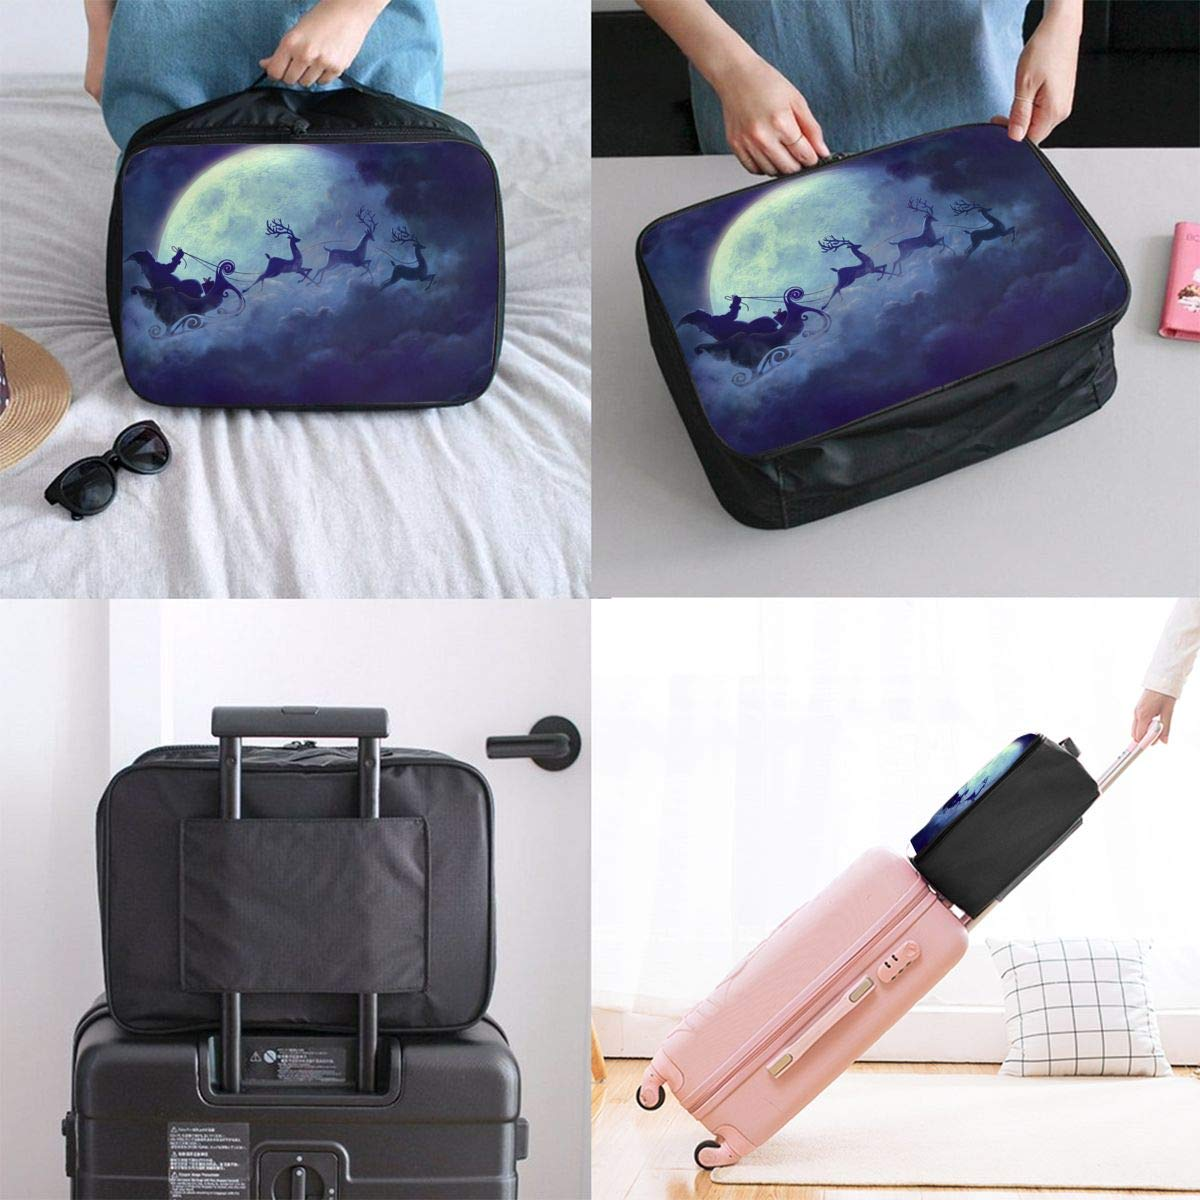 YueLJB Christmas Santa Claus Reindeer Lightweight Large Capacity Portable Luggage Bag Travel Duffel Bag Storage Carry Luggage Duffle Tote Bag